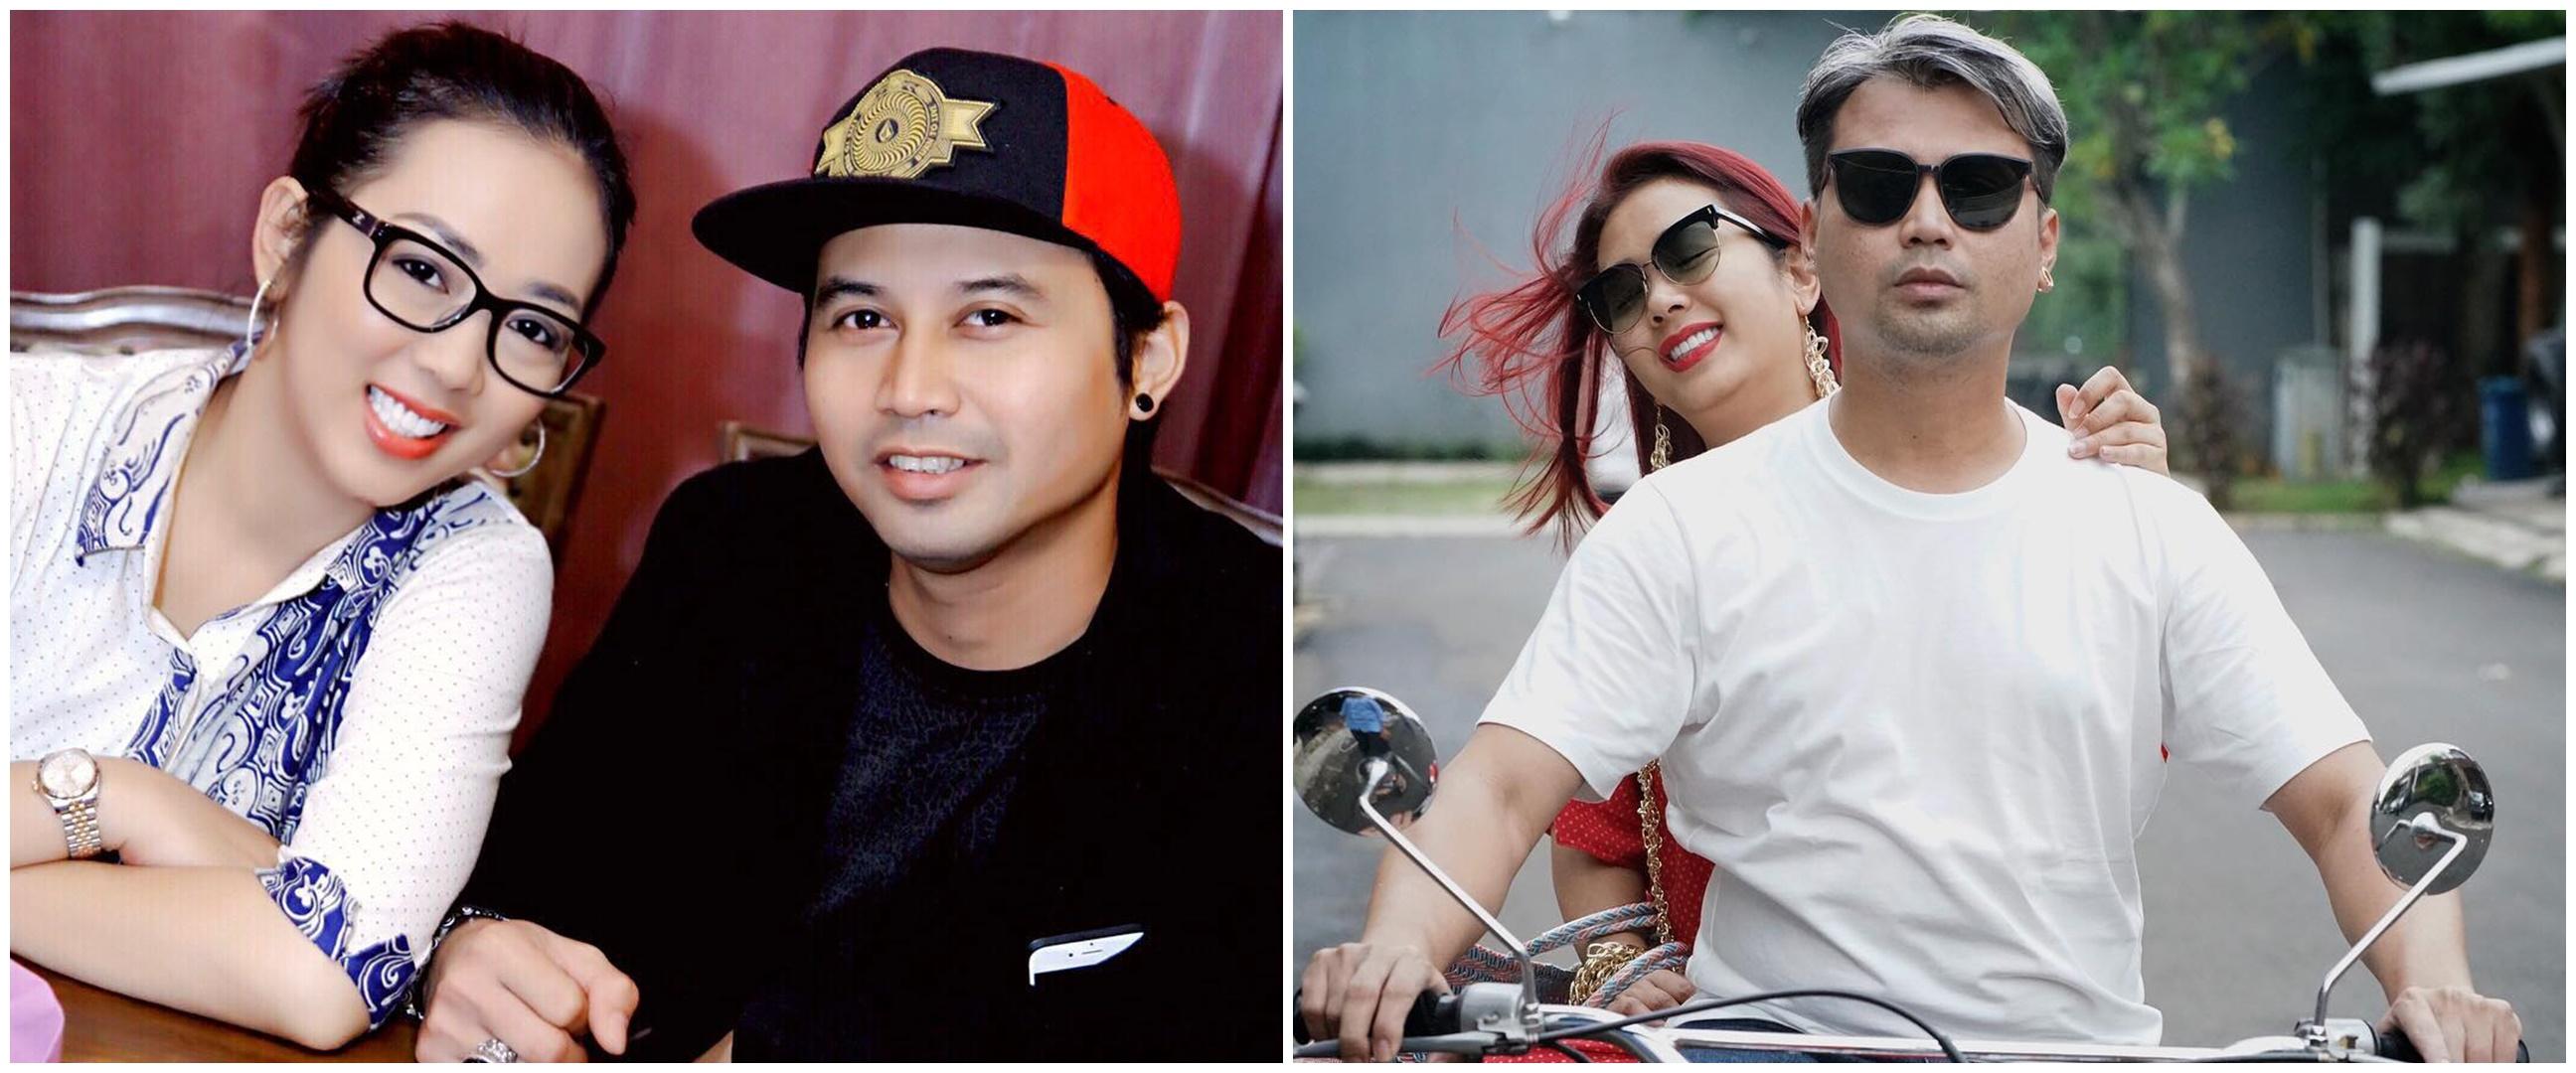 Suami Soimah dapat julukan 'Crazy Rich Bantul', begini ceritanya